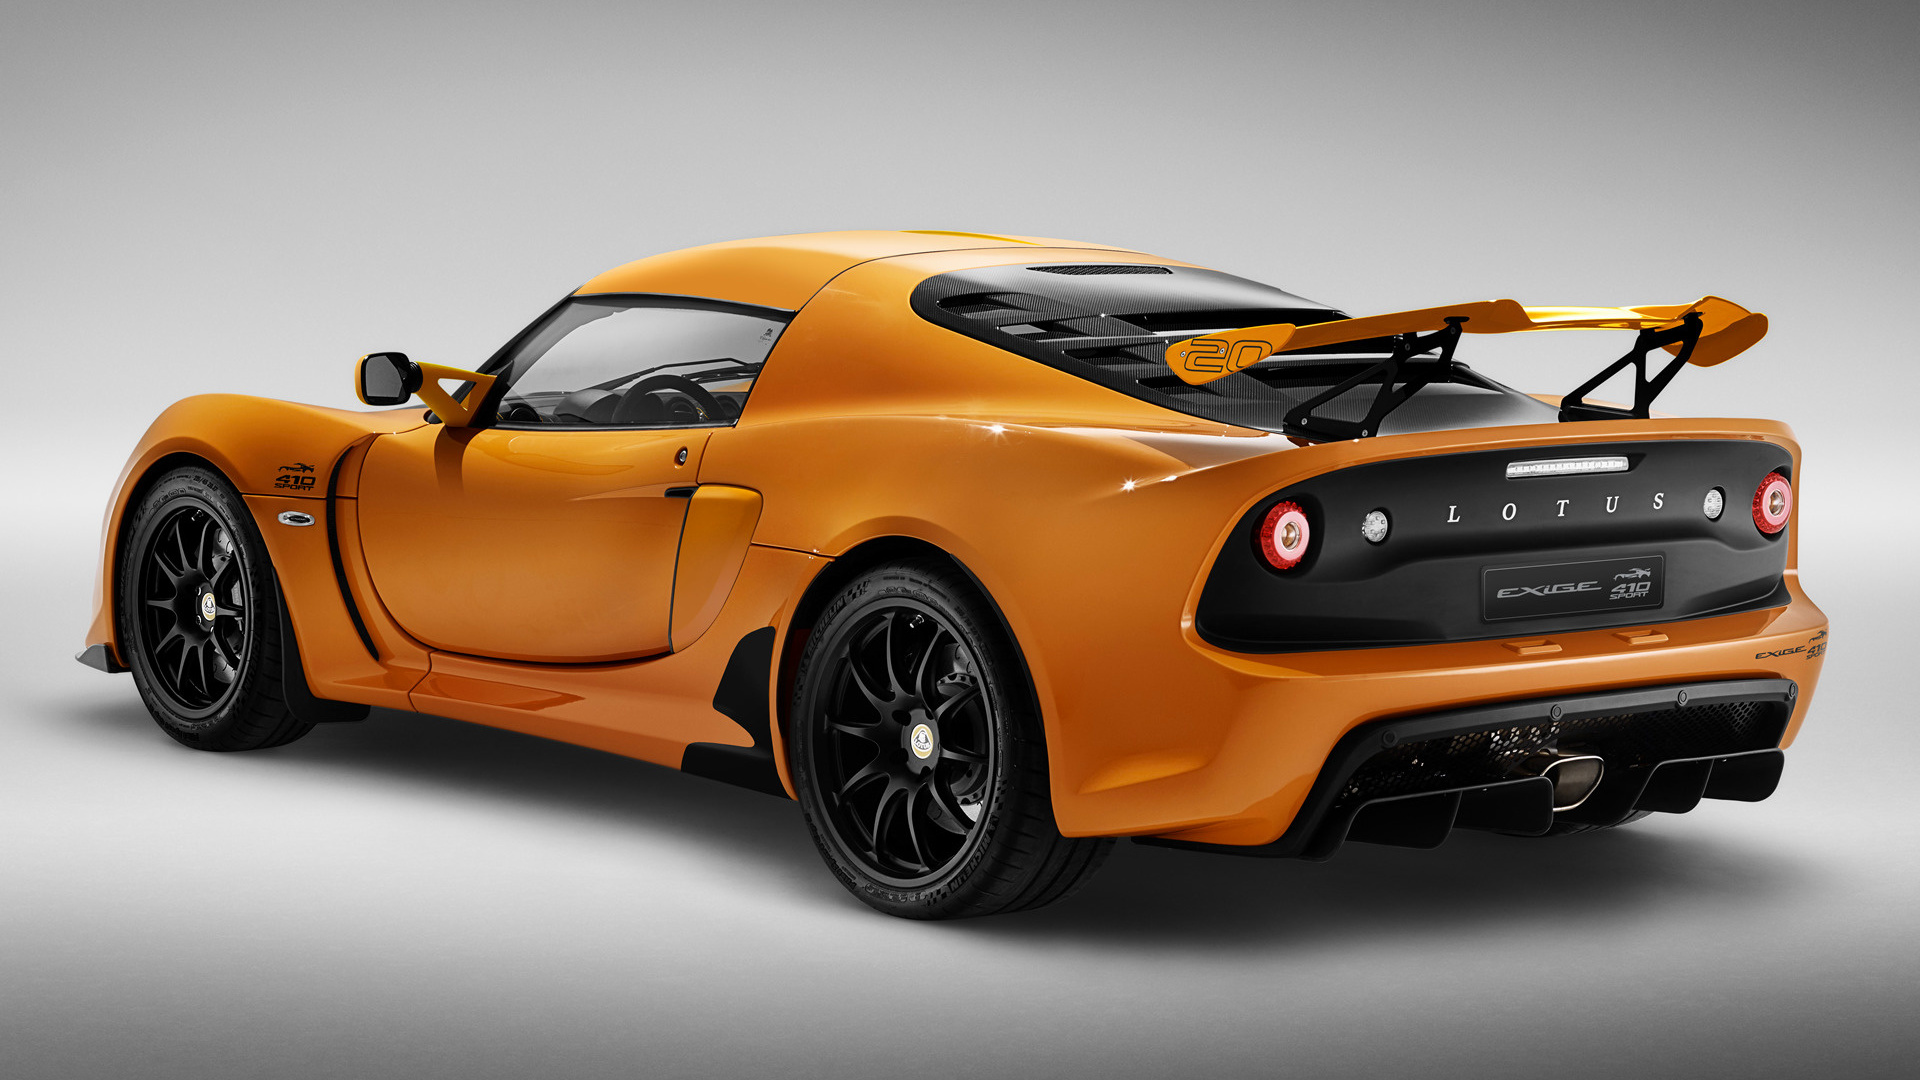 2020 Lotus Exige Sport 410 20th Anniversary - Wallpapers ...